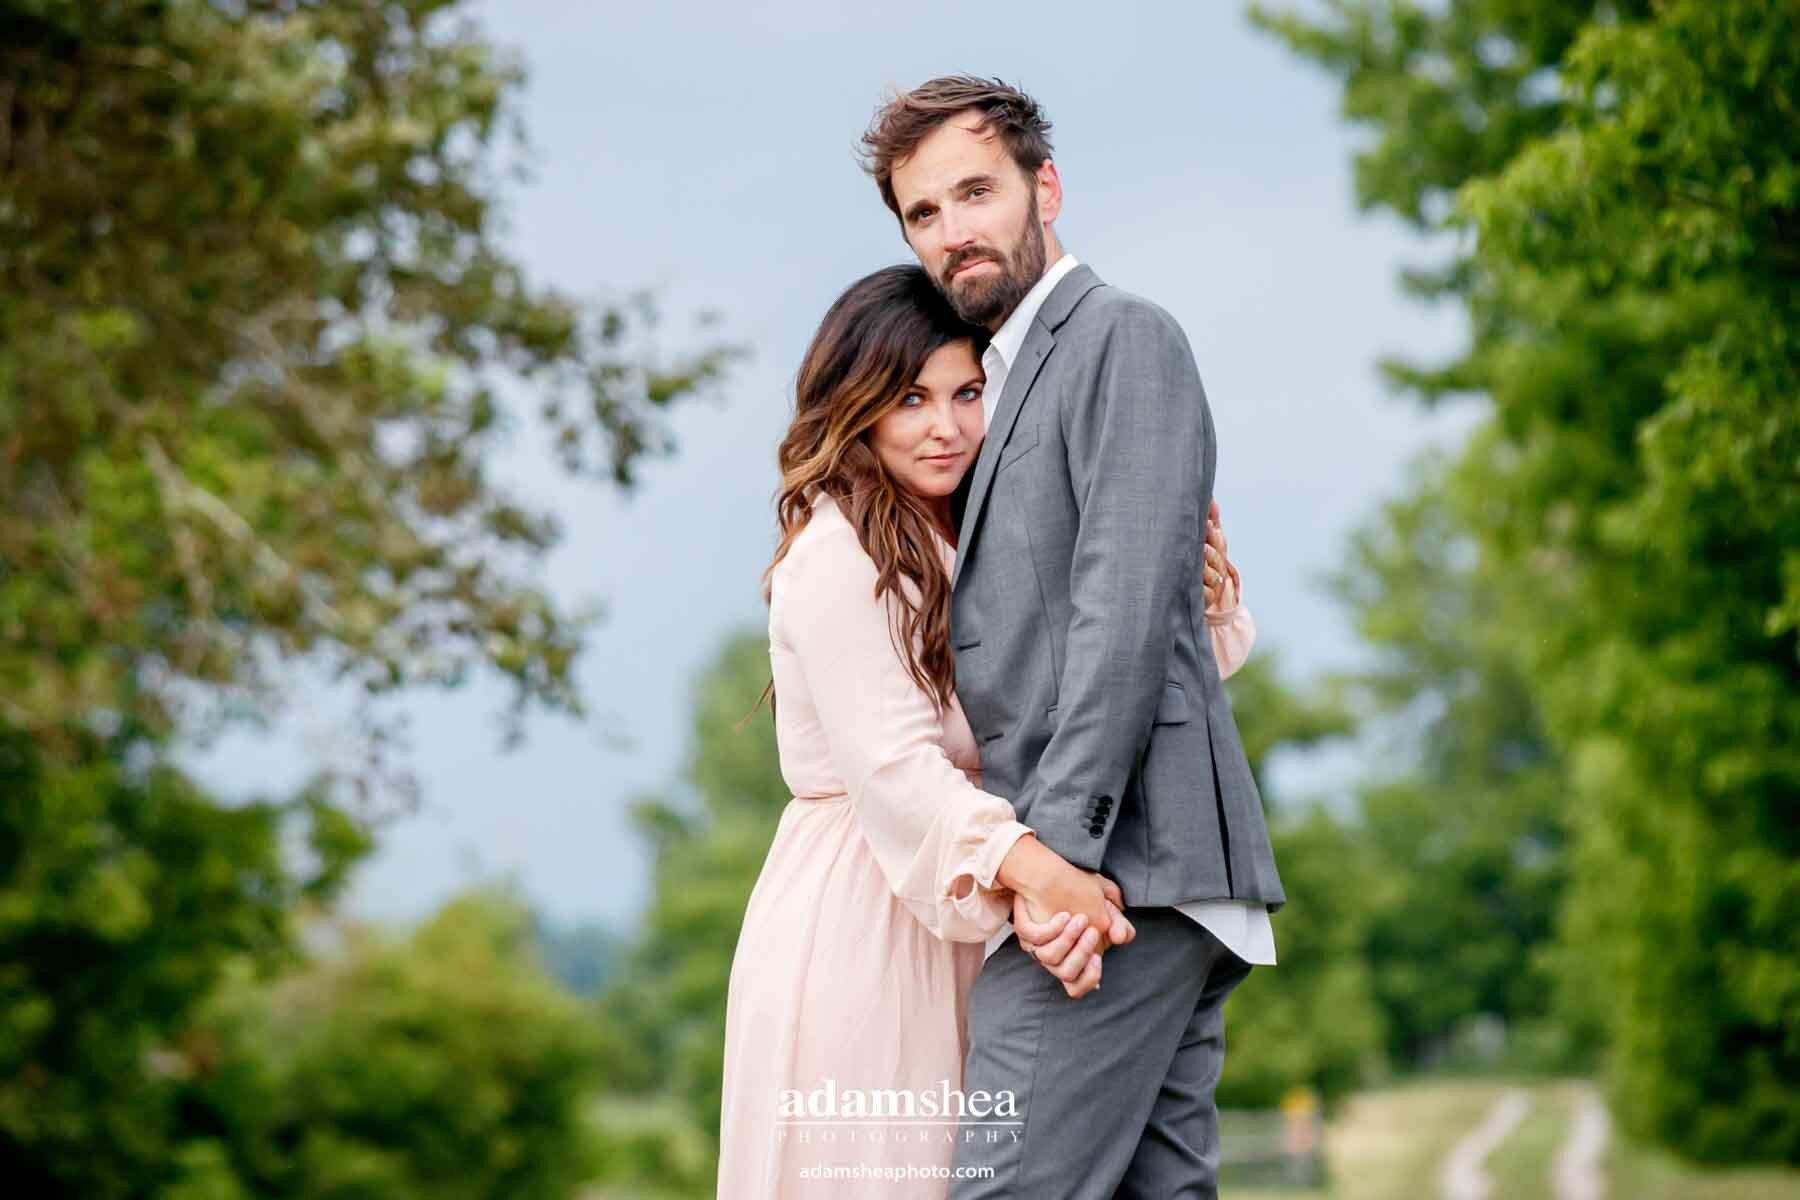 amy-adam-engagement-photos-larsen-wi-neenah-winding-trail-flowy-dress-grey-suit-adam-shea-photography-green-bay-appleton-neenah-photographer-17.jpg